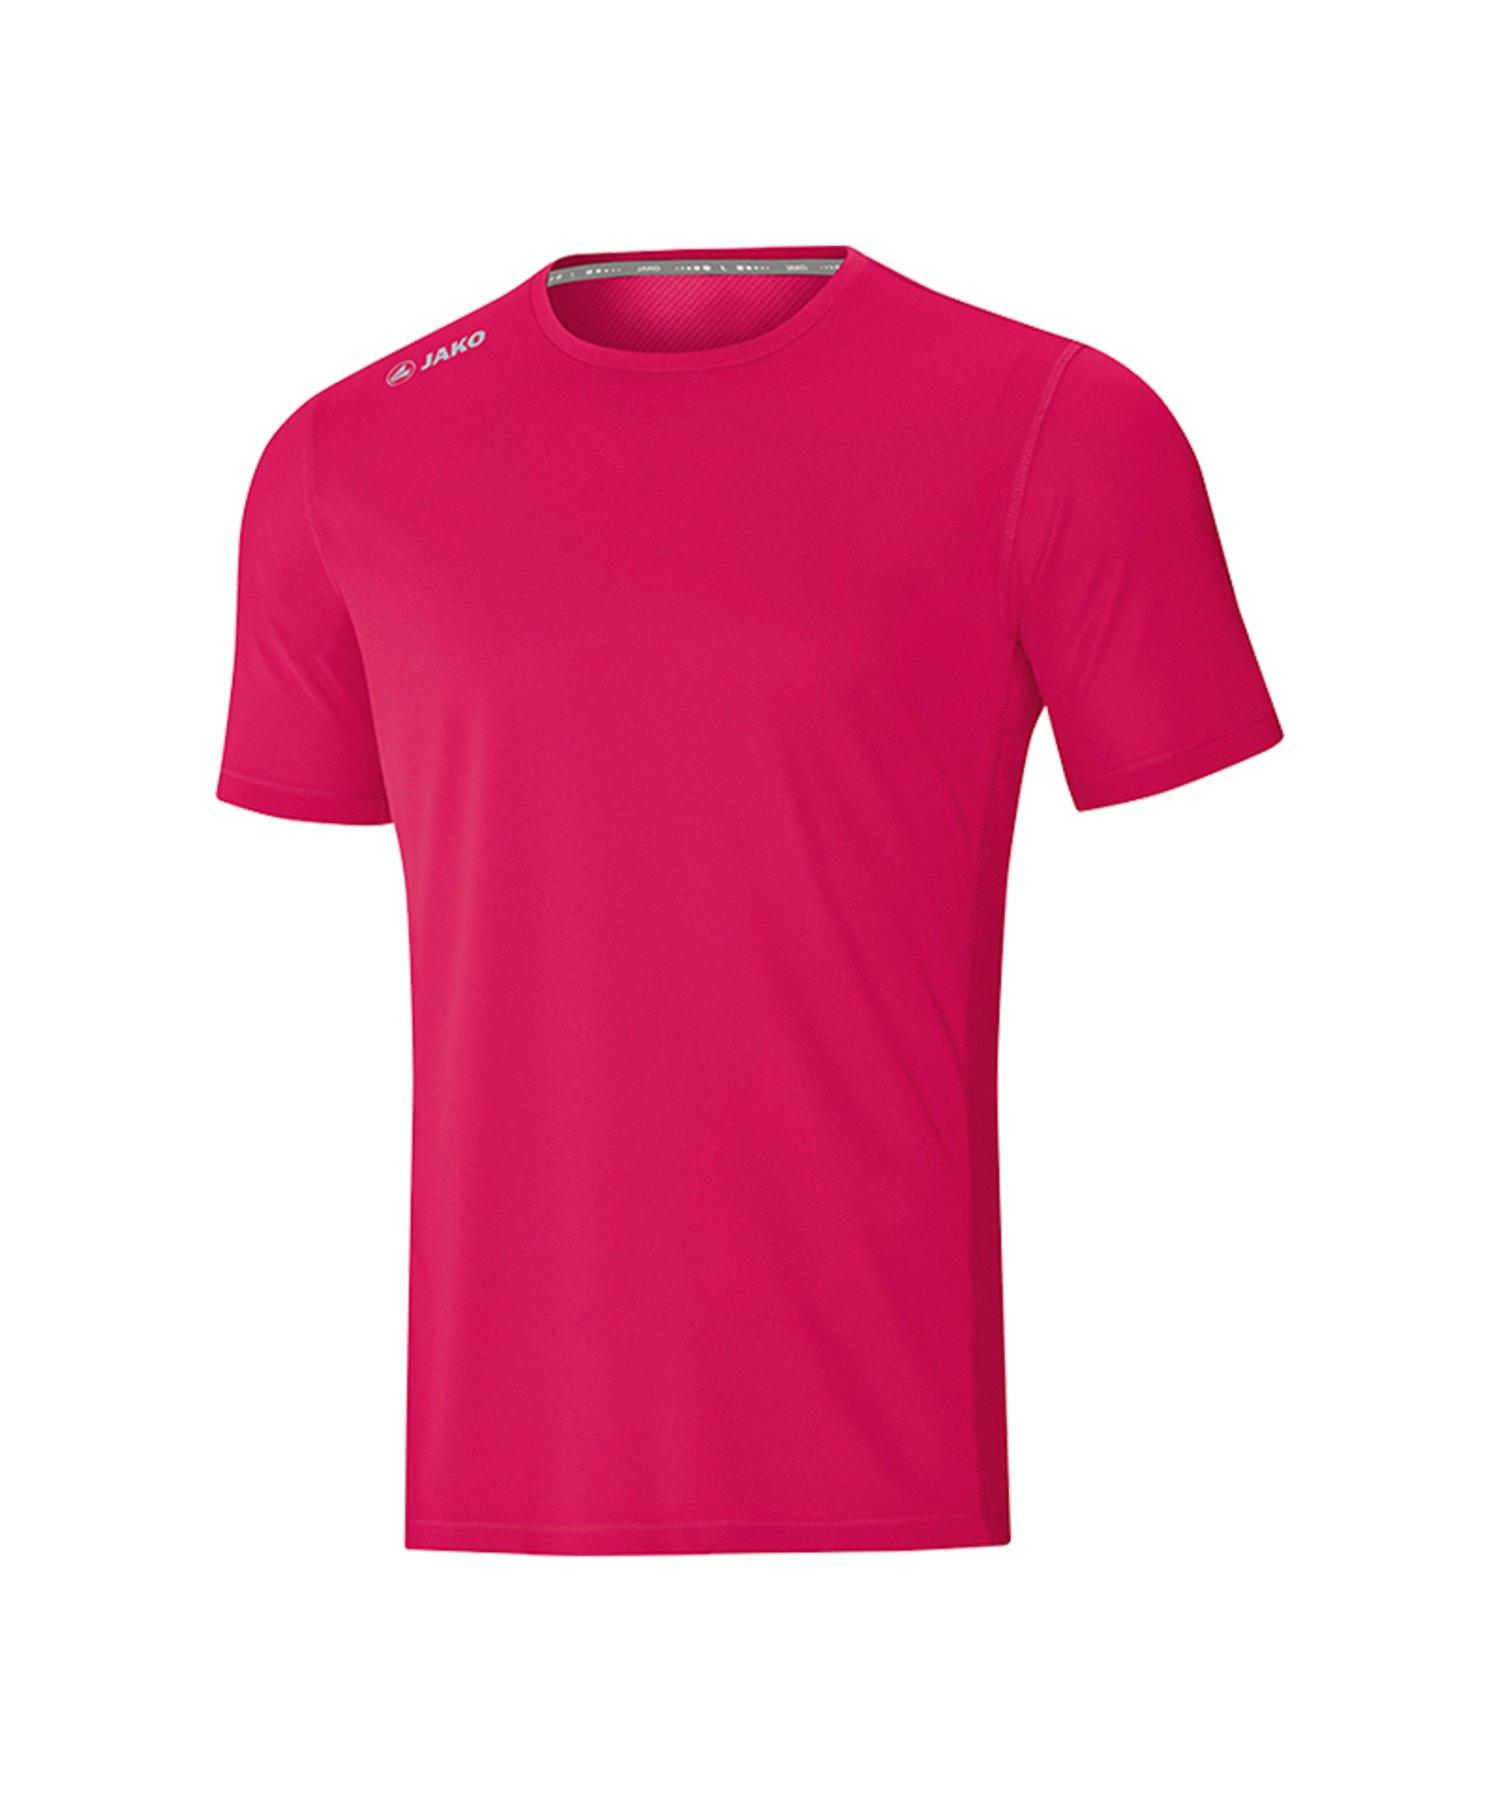 Jako Run 2.0 T-Shirt Running Pink F51 - Pink